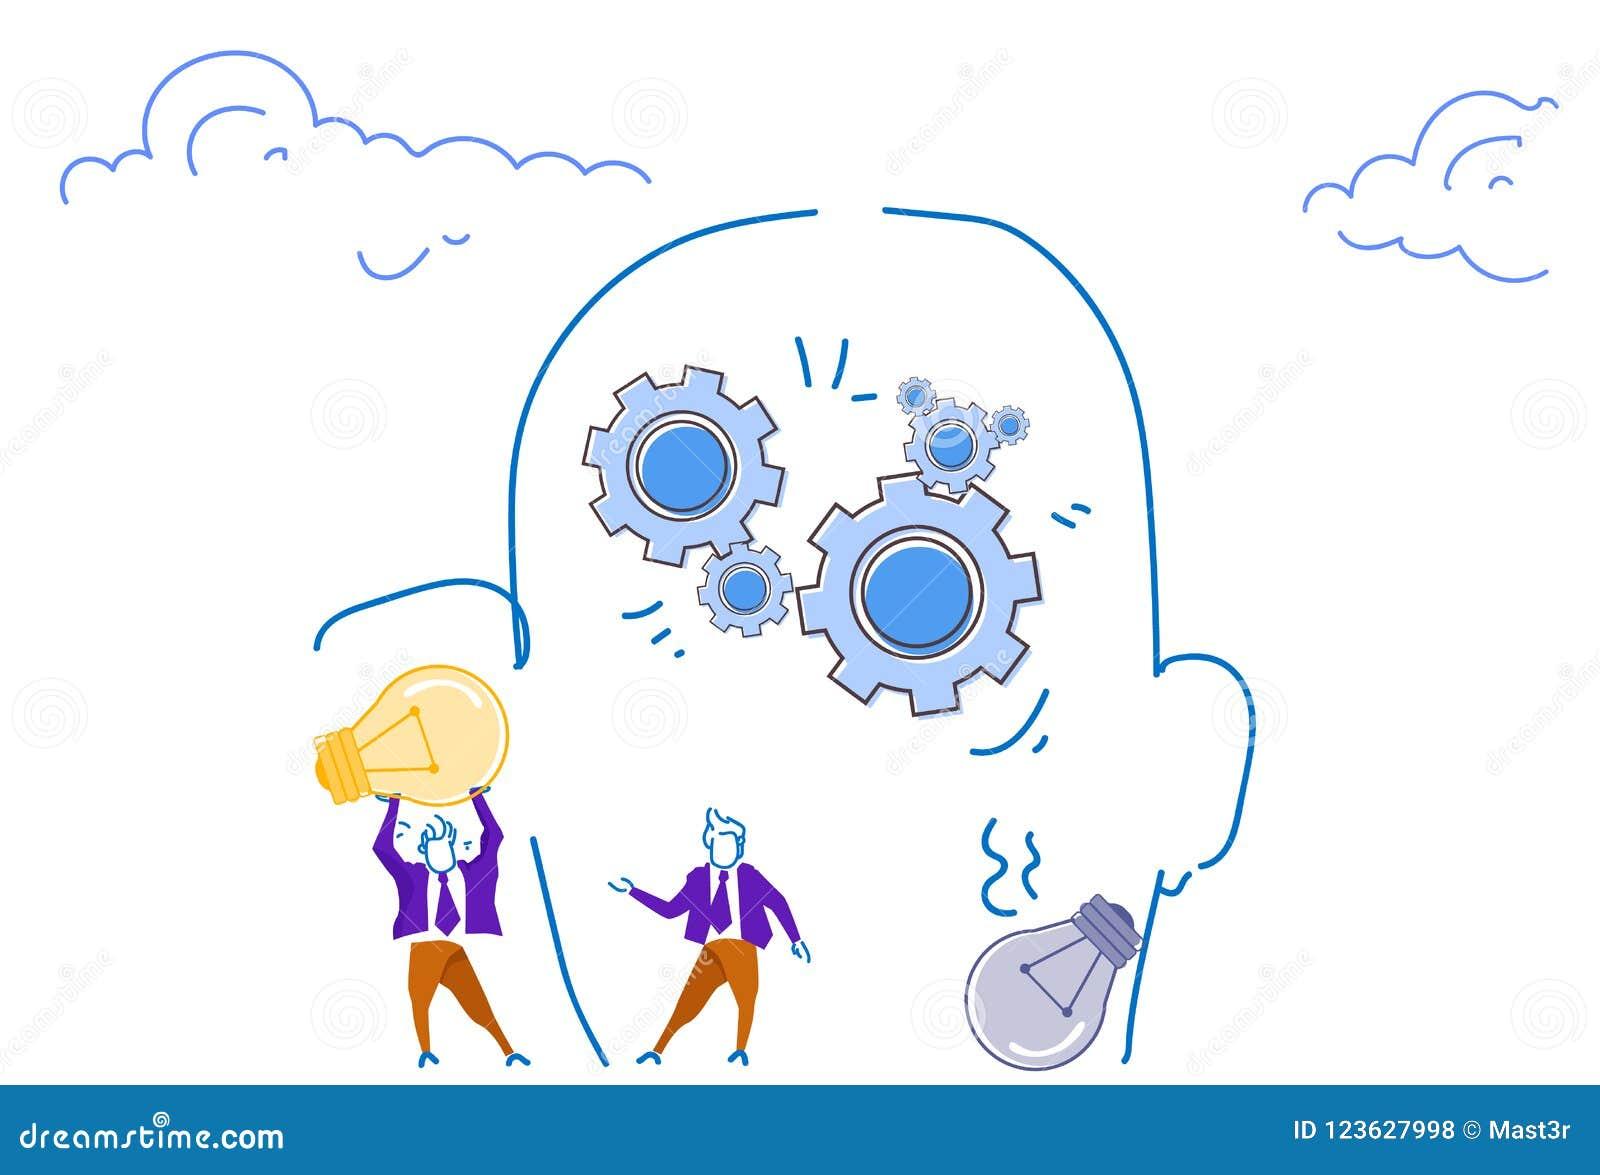 Businessmen holding light lamp human head silhouette gear wheels brainstorming process generate new idea teamwork